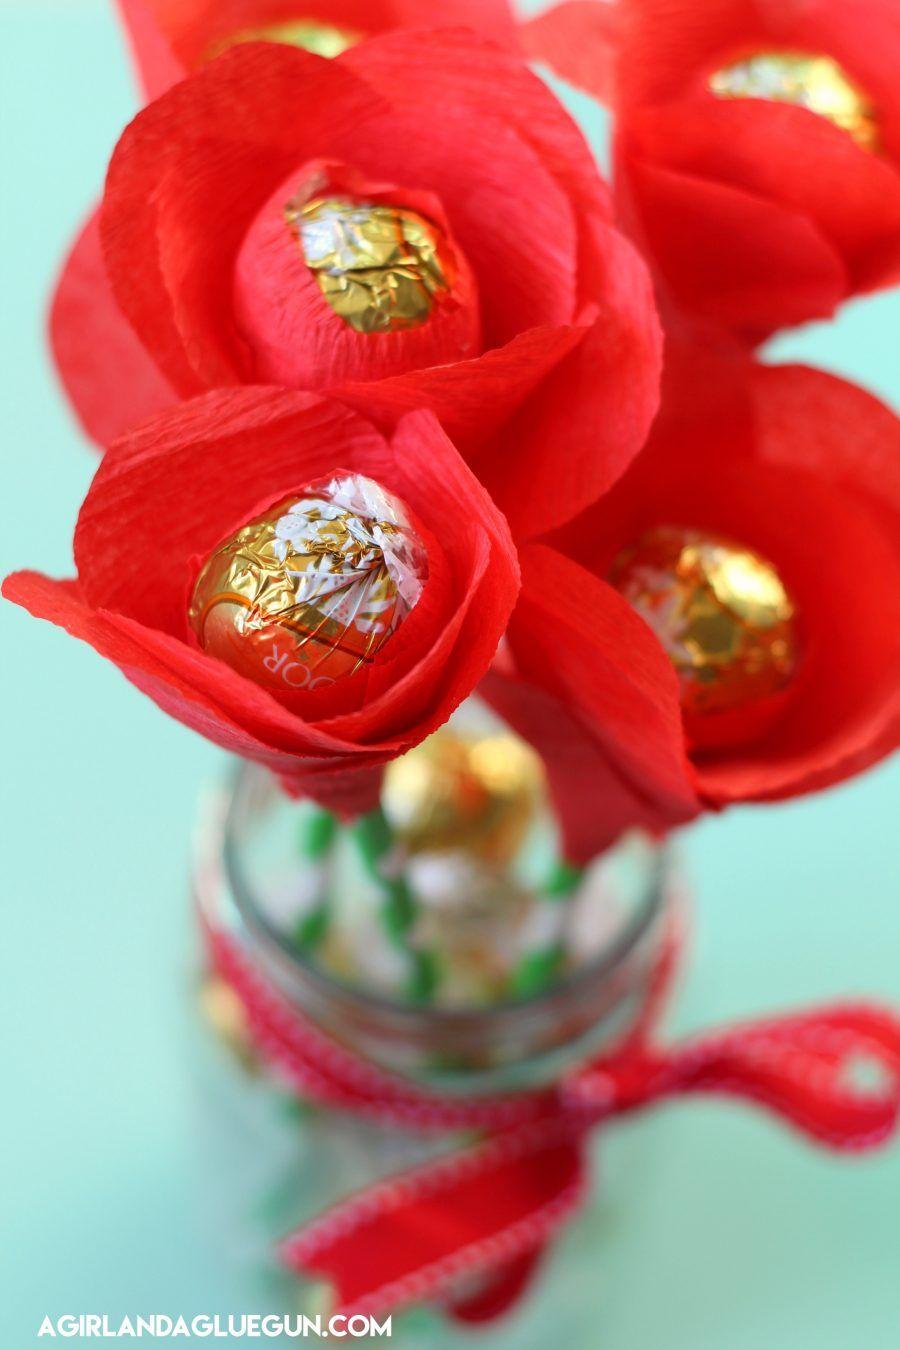 Candy flower bouquet glue guns flower bouquets and crepe paper candy flower bouquet a girl and a glue gun izmirmasajfo